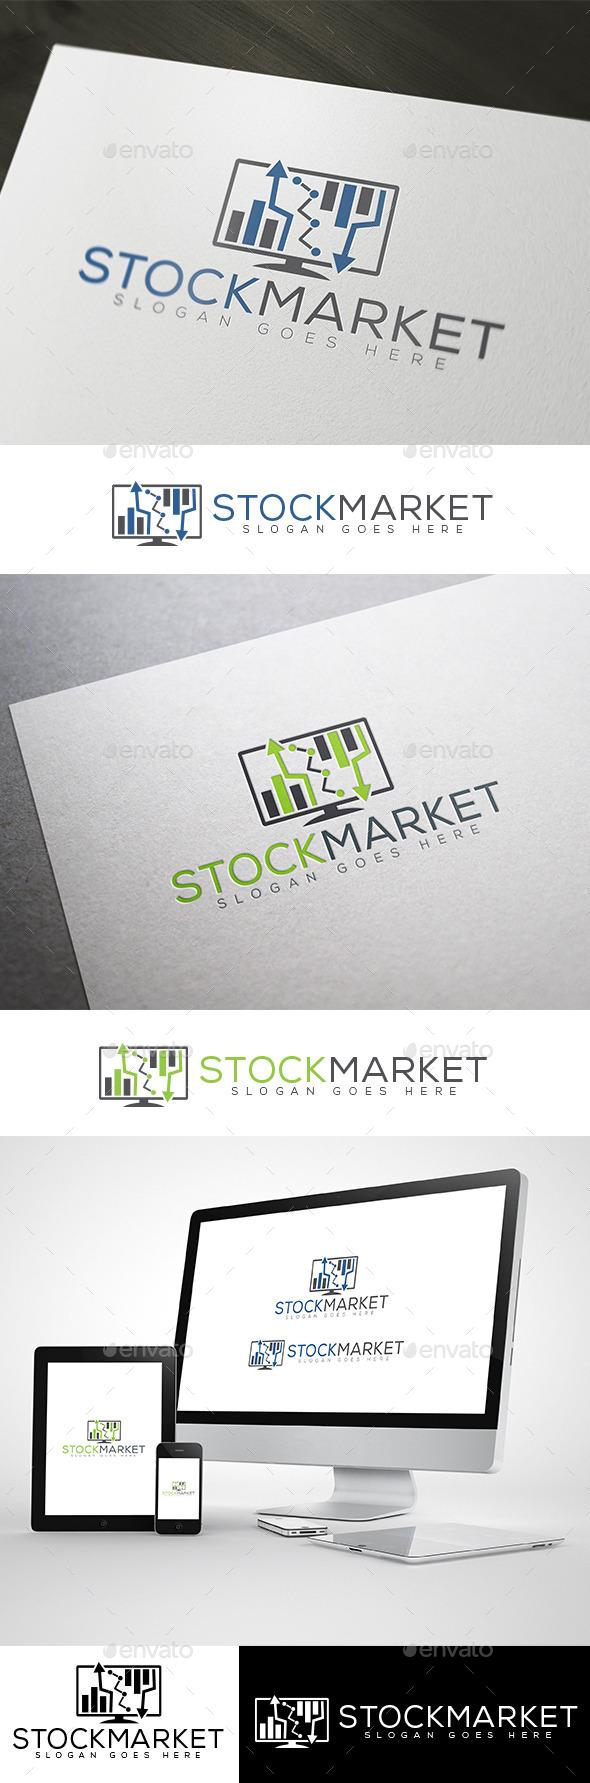 GraphicRiver Stock Market & Online Finance Logo 10478300